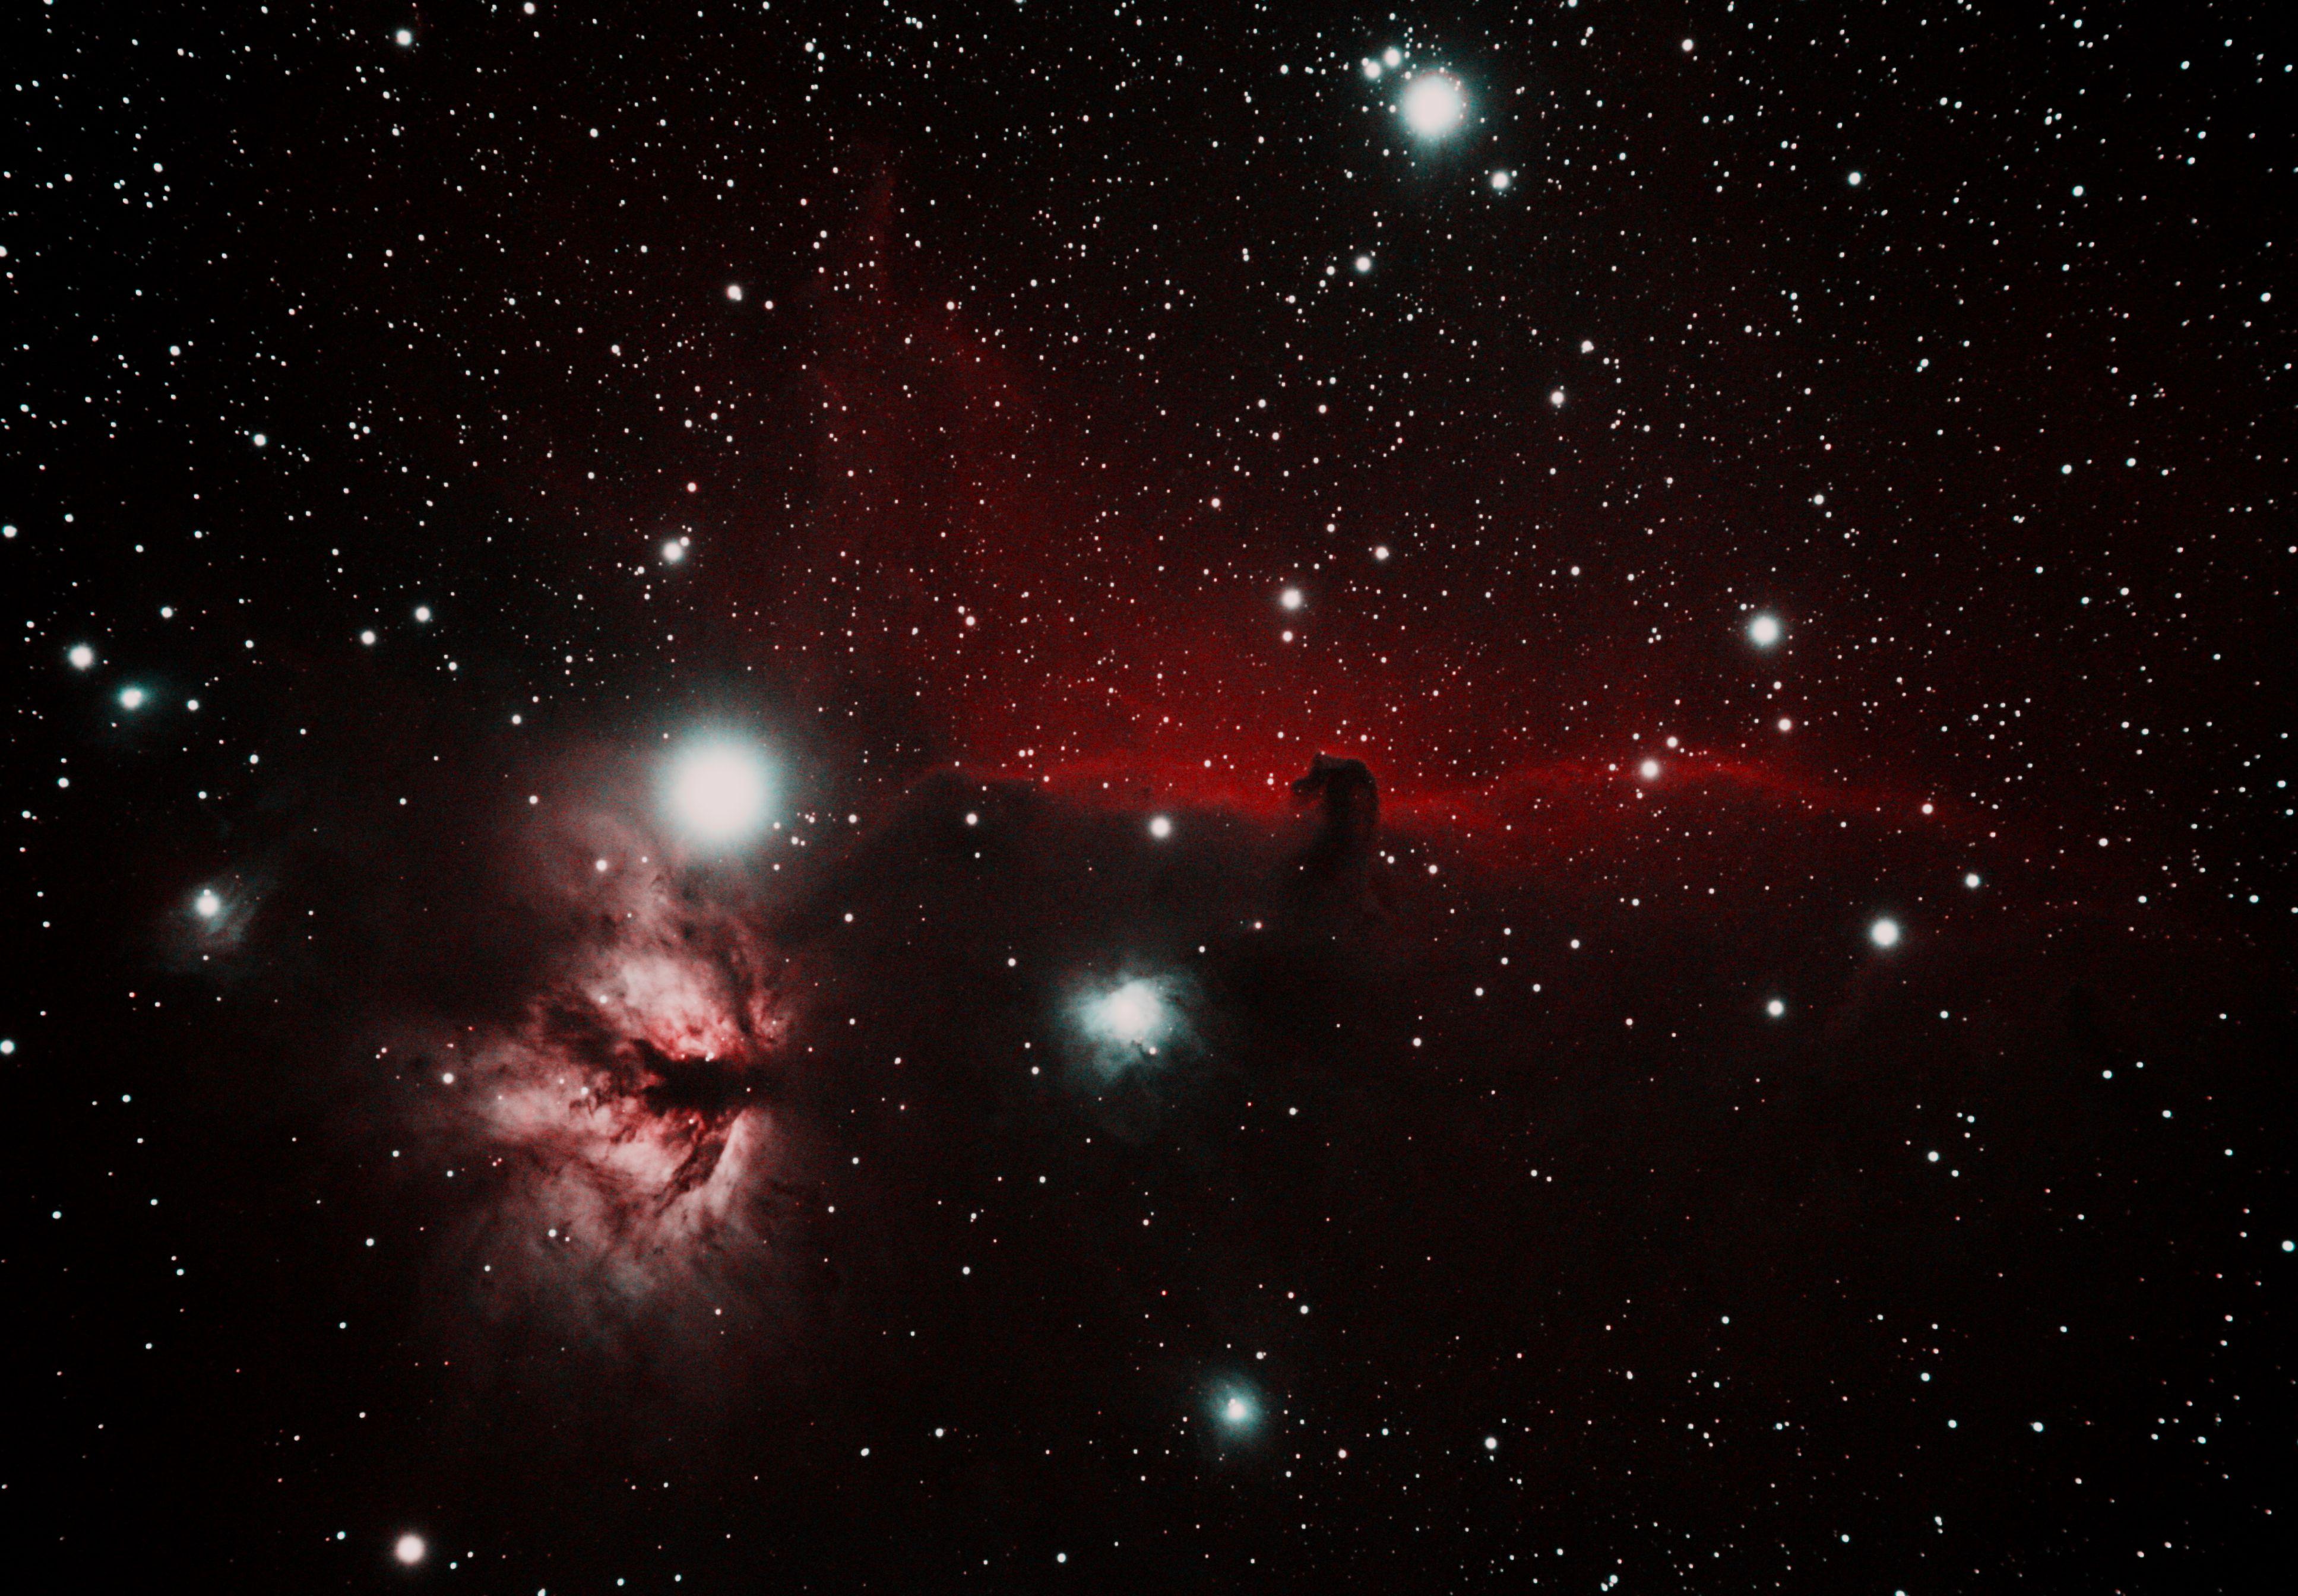 Horsehead Nebula 11-2-13